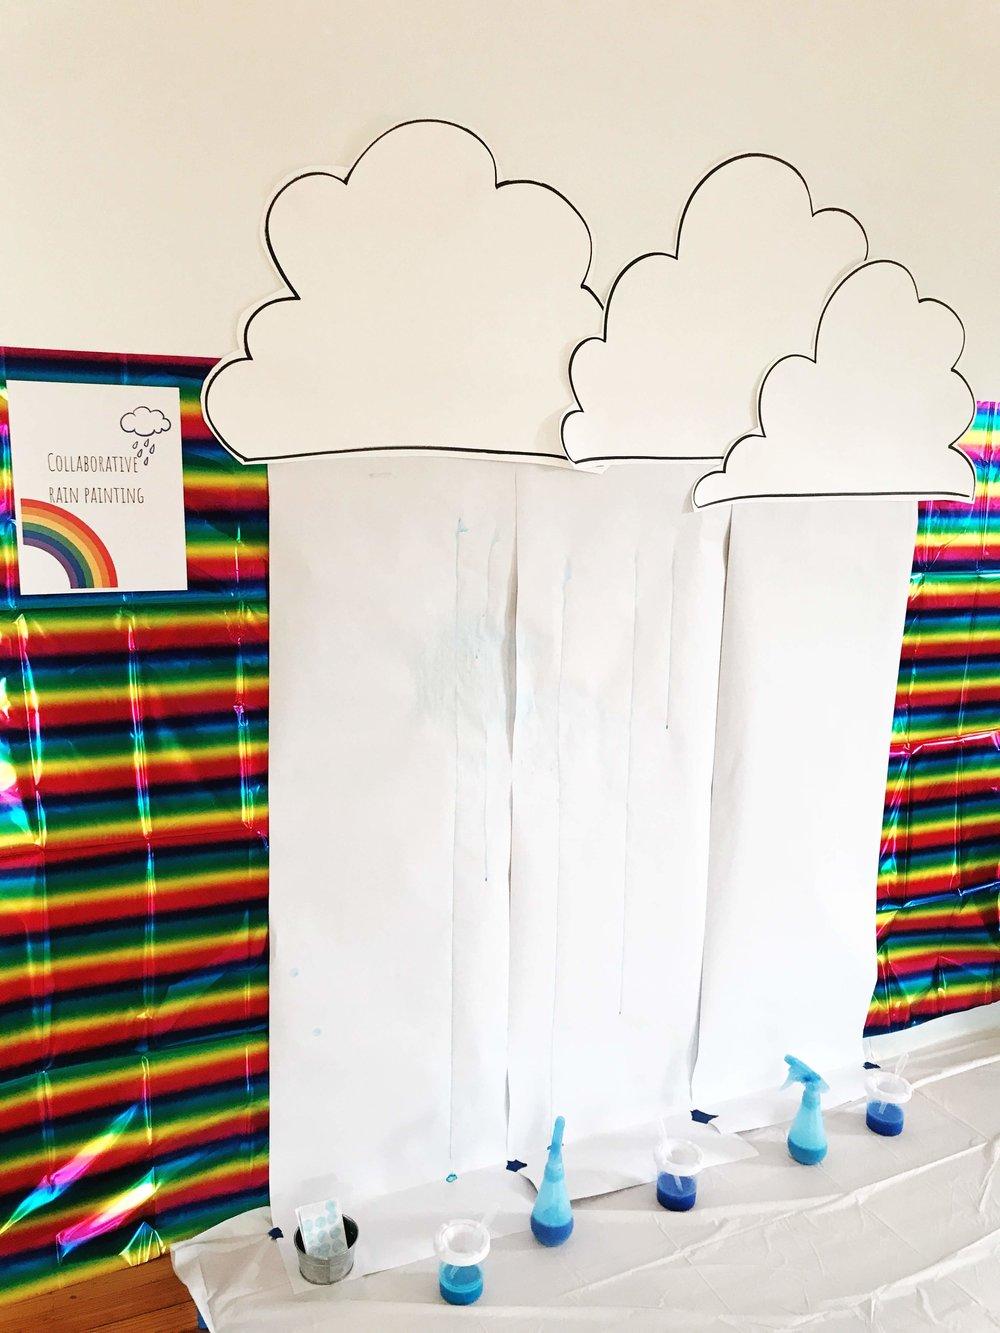 Collaborative Rain Painting